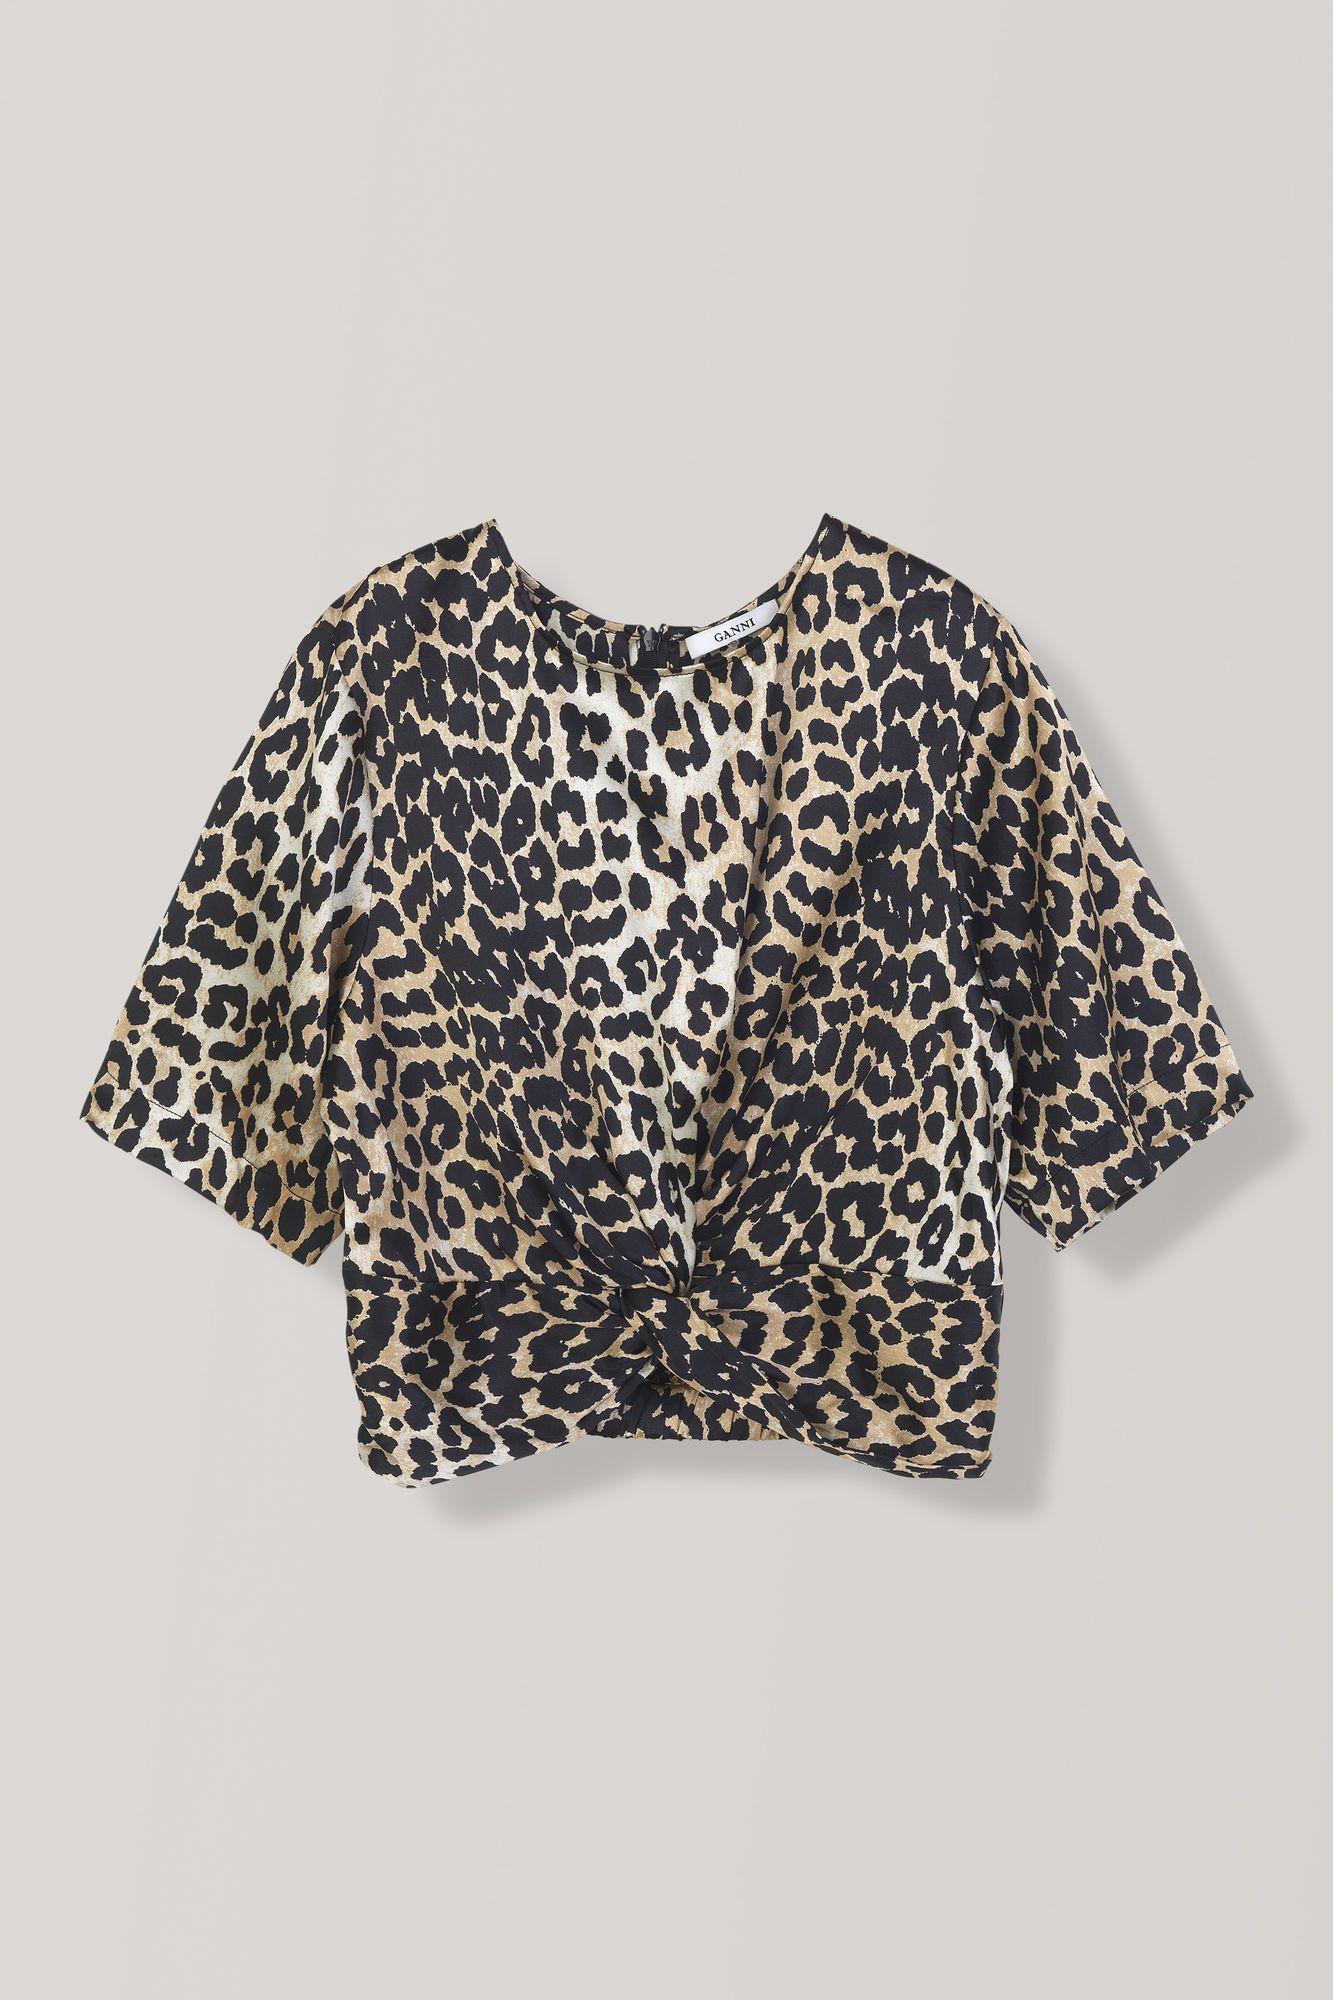 1a920253 Calla Silk Twist Blouse, Leopard | Clothes to Envy | Blouse, Tops ...